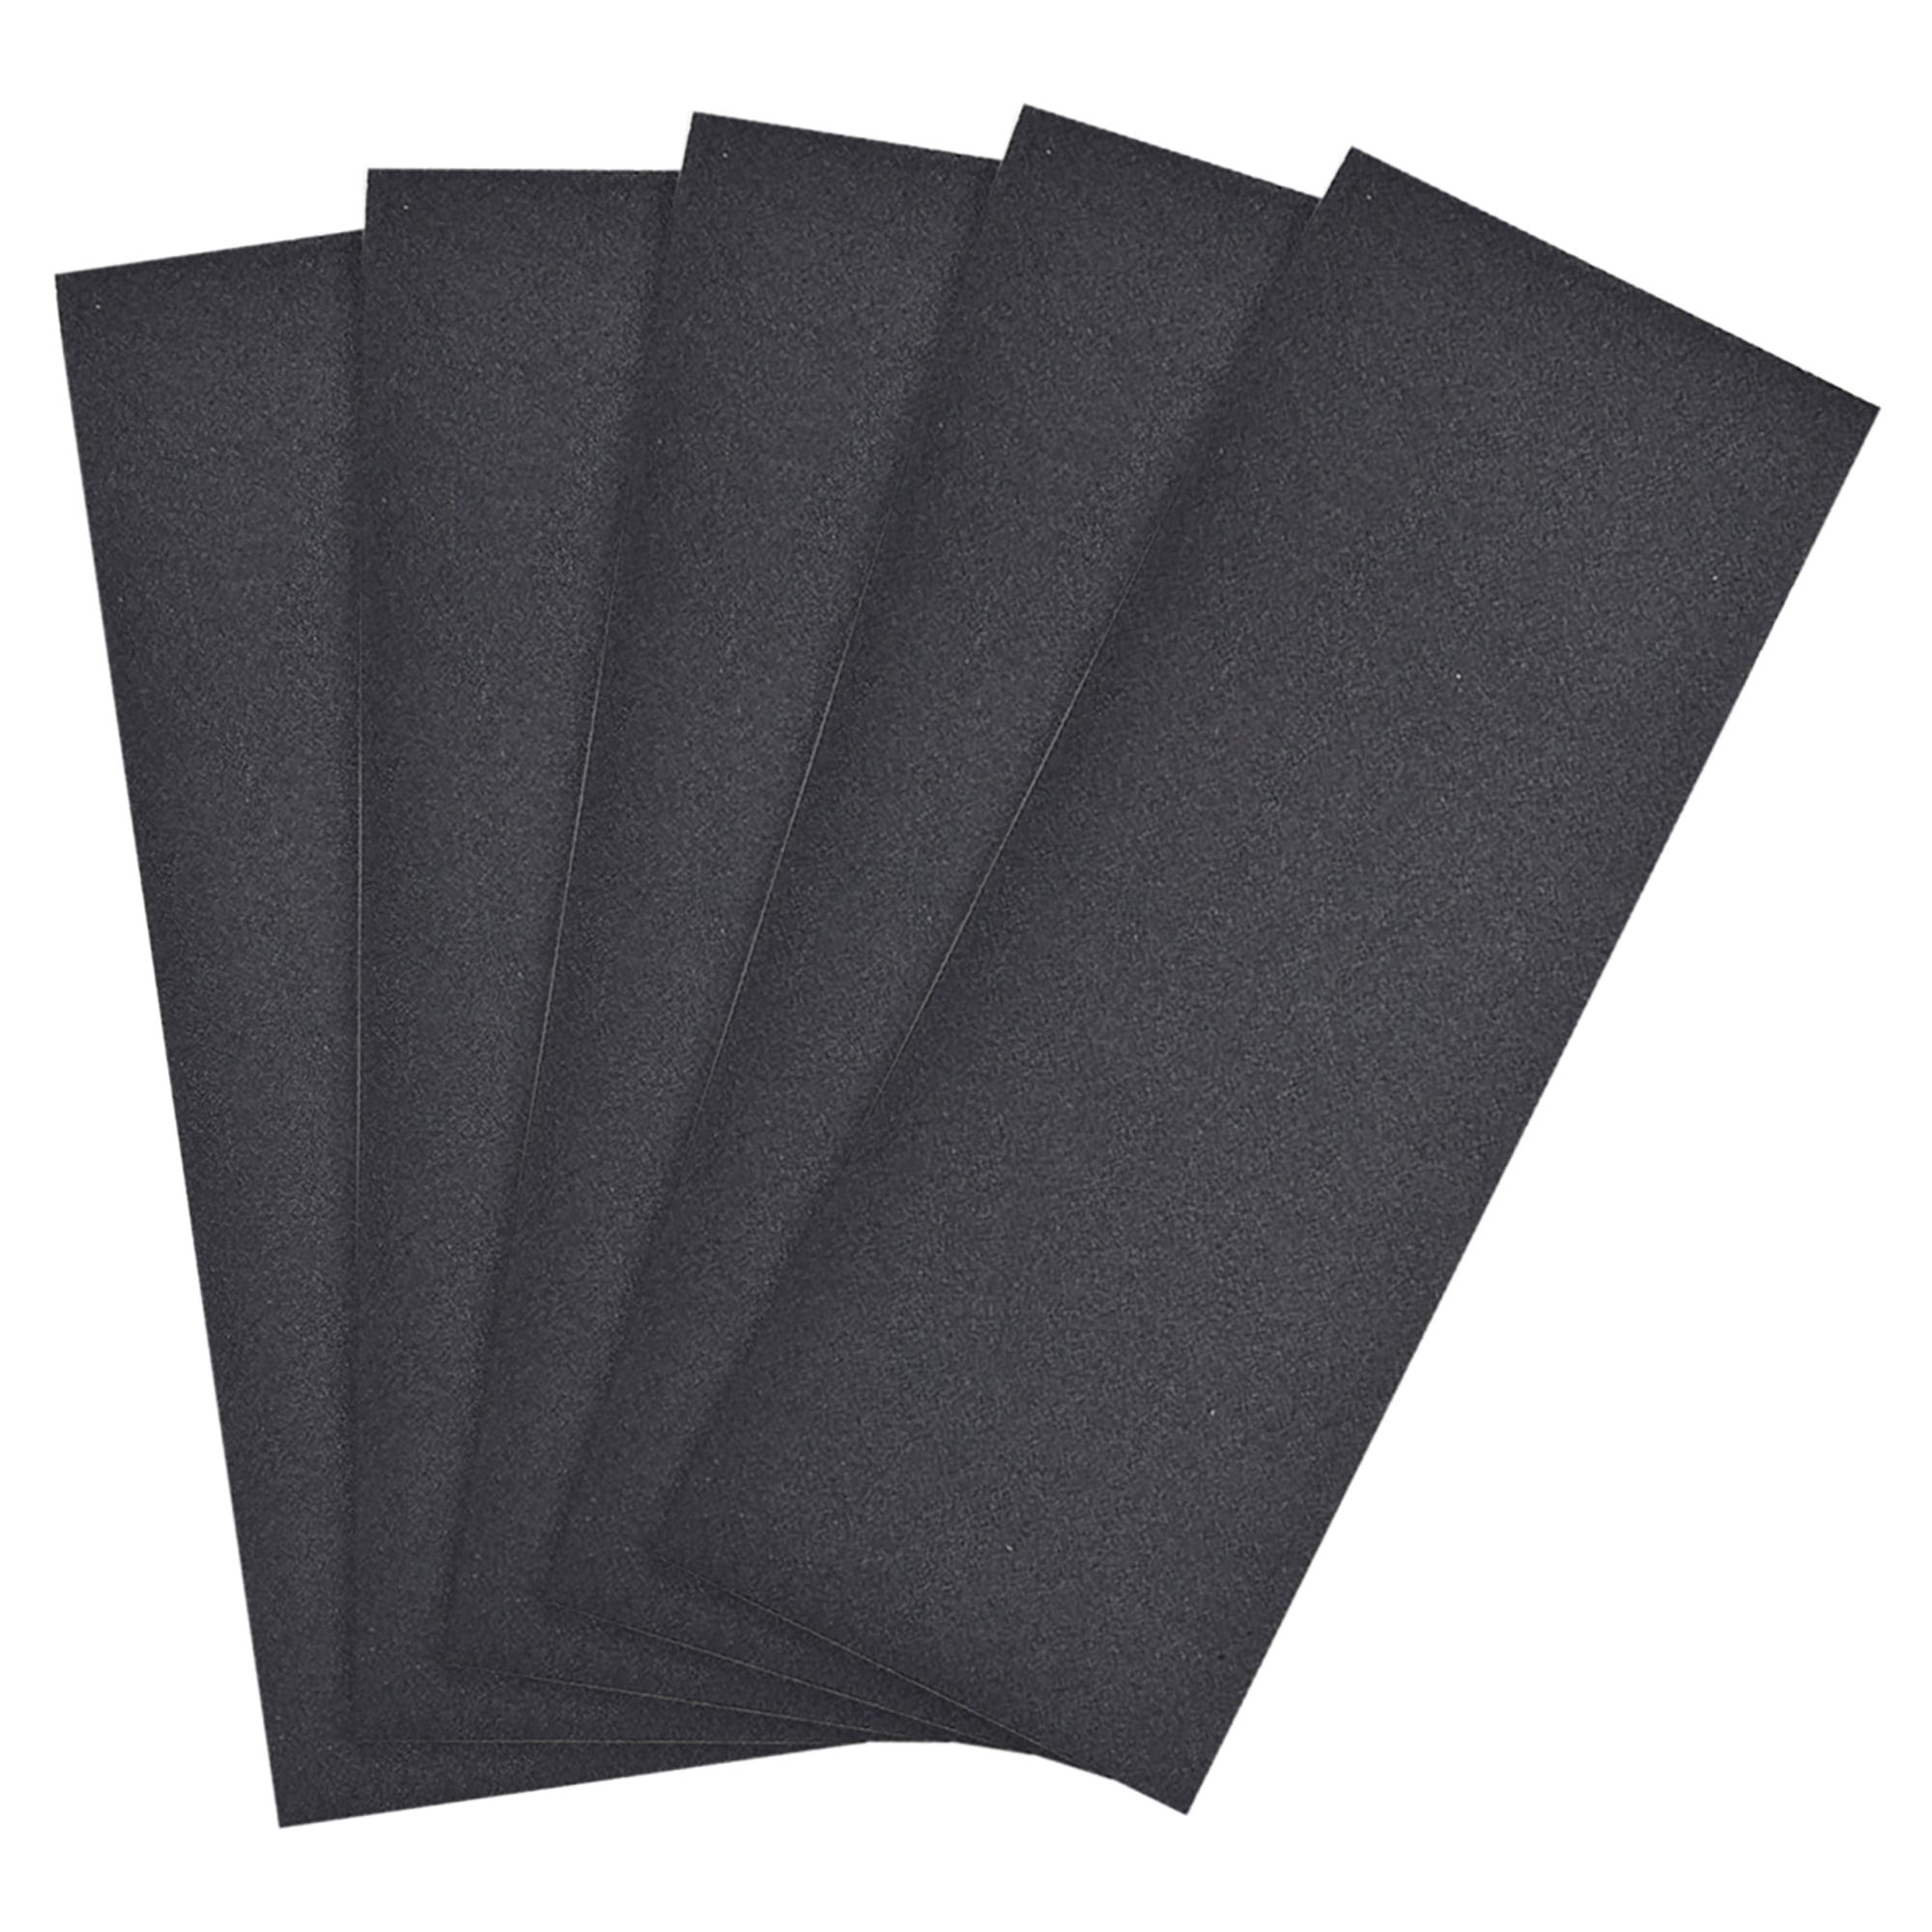 Waterproof Sandpaper Wet Dry Sand Paper Grit Of 220 For